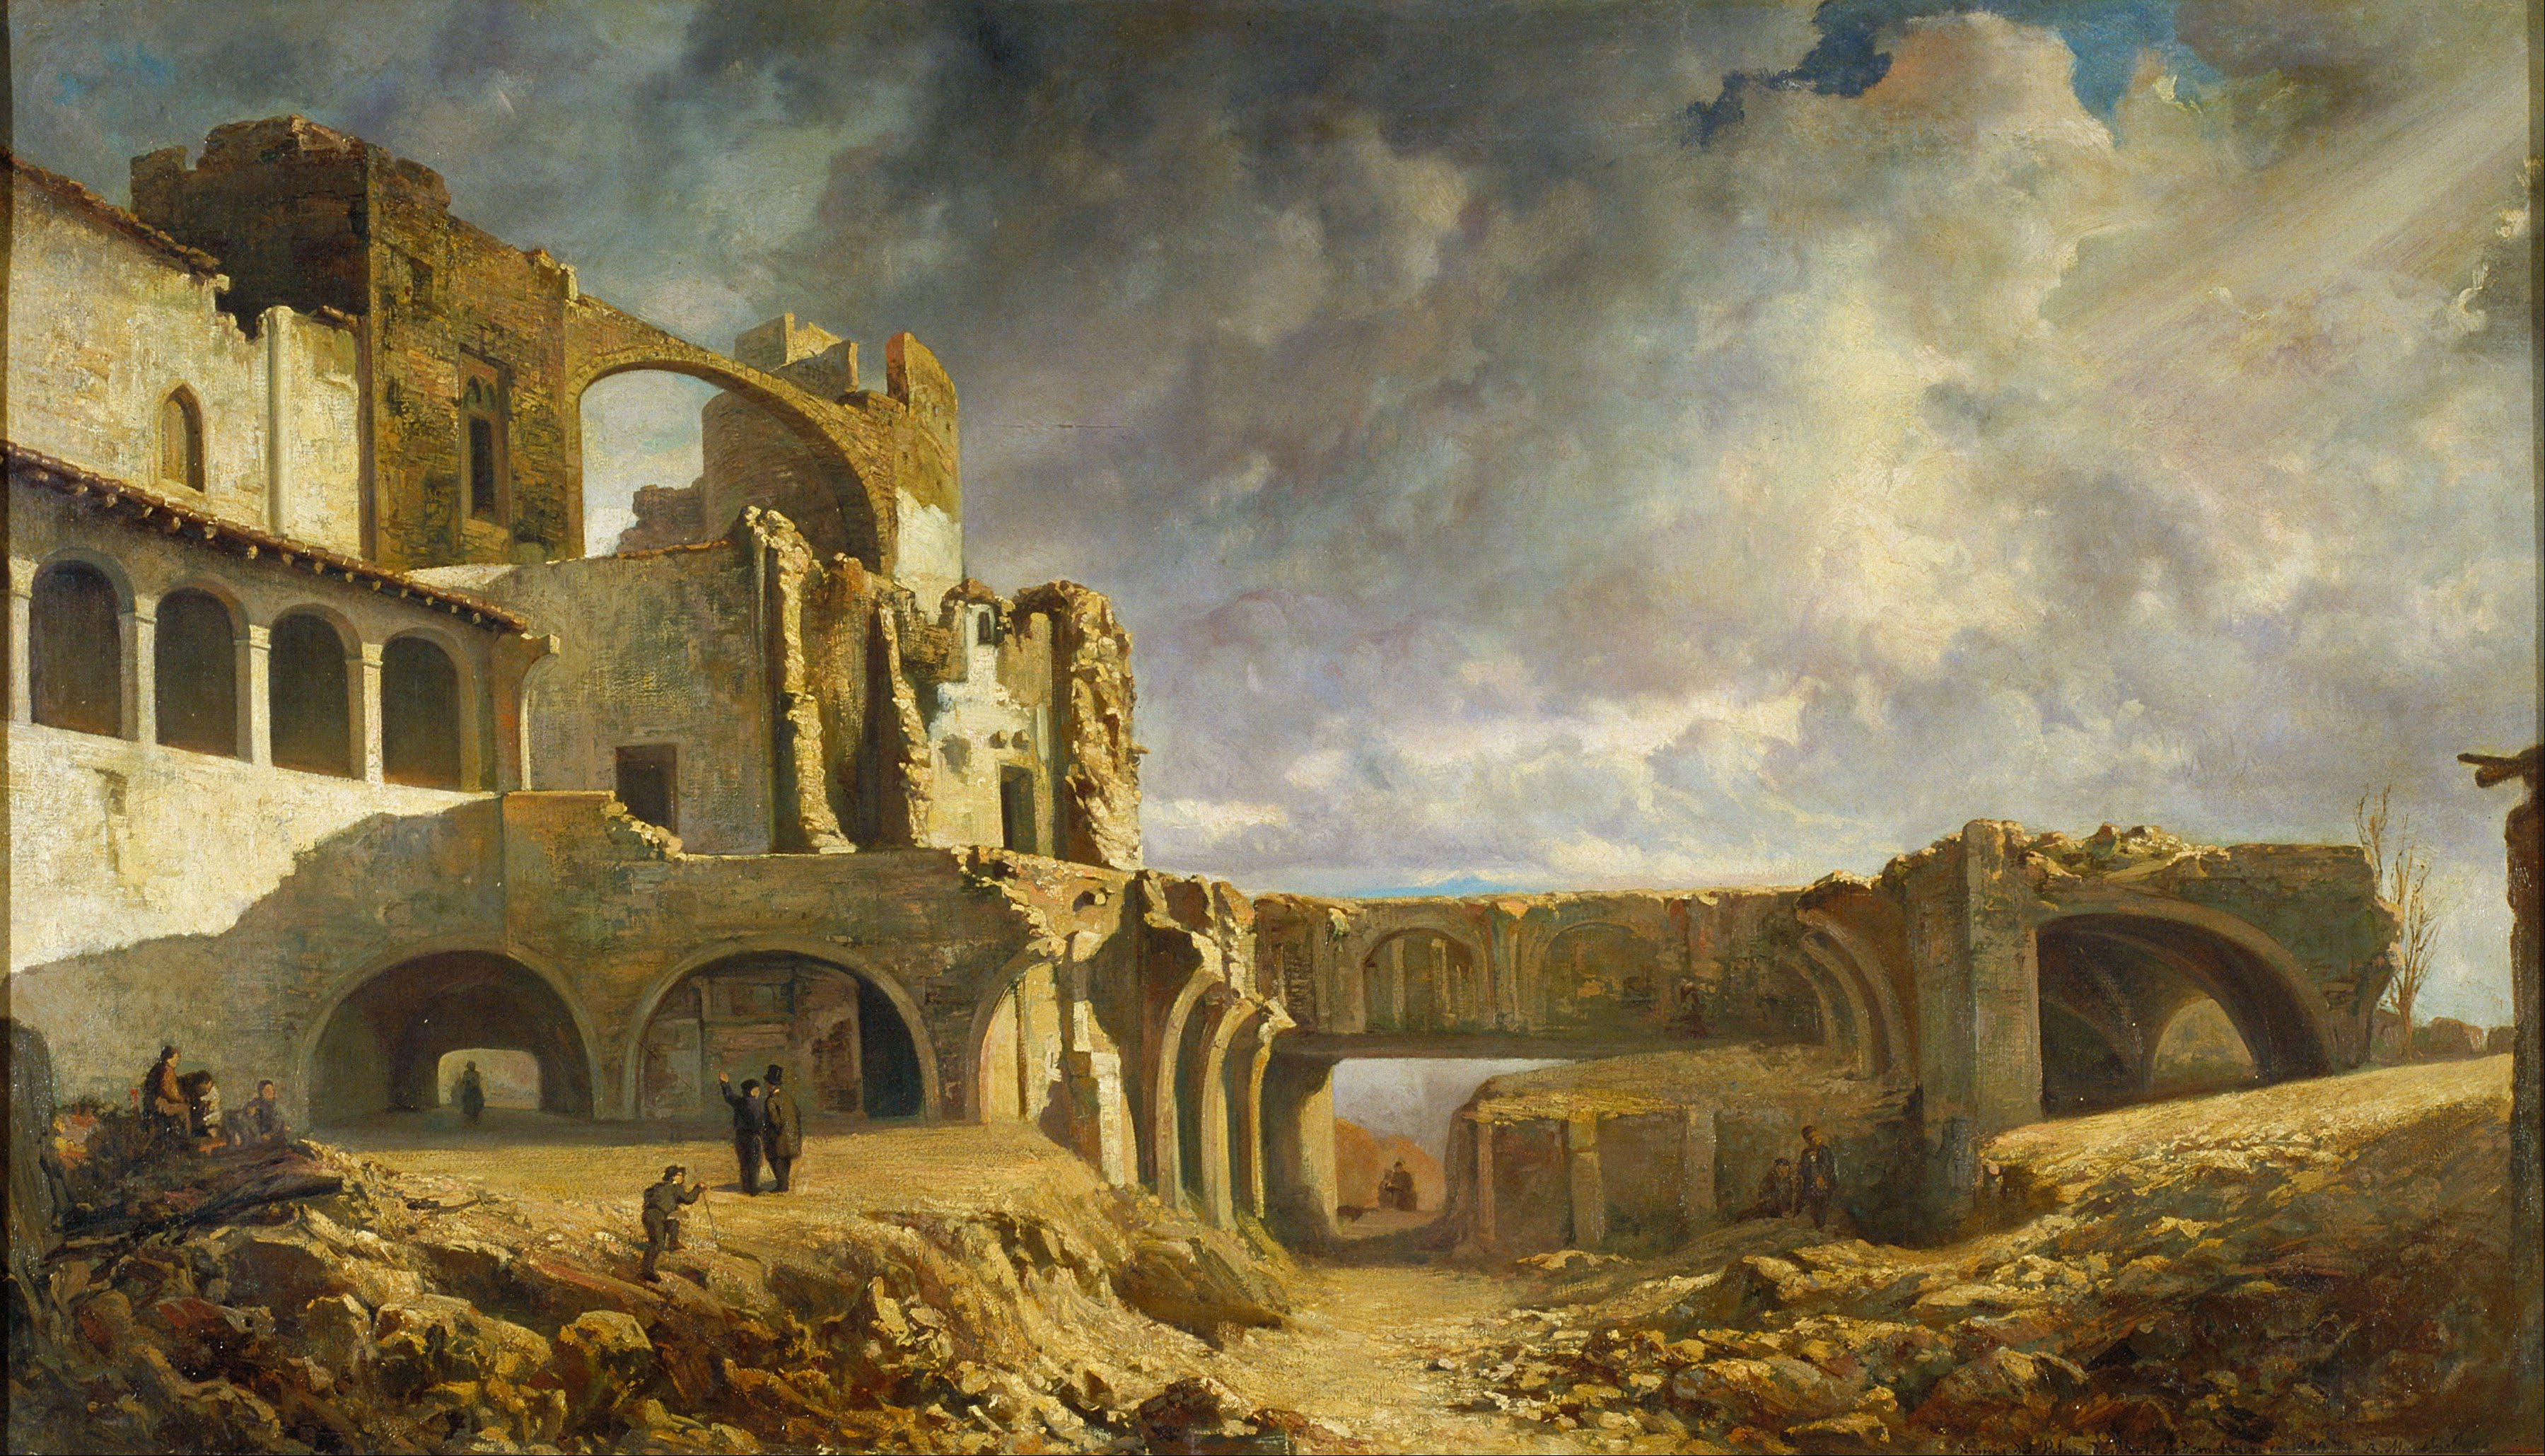 Ruins in art: Ramon Martí Alsina, Ruins of the Palace,